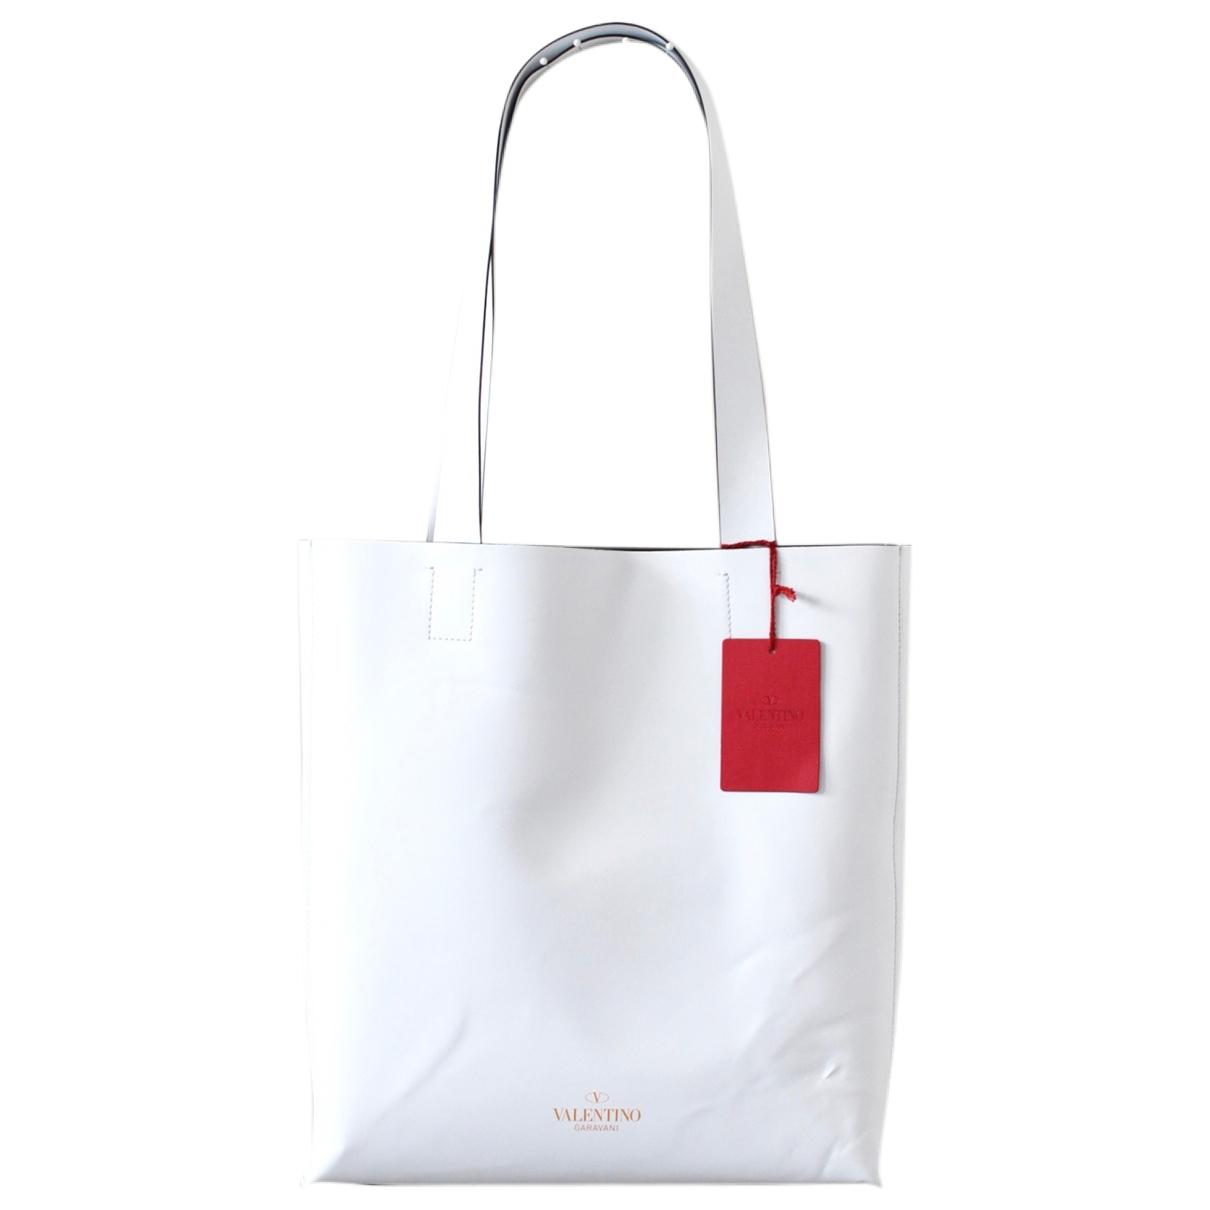 Valentino Garavani \N White handbag for Women \N